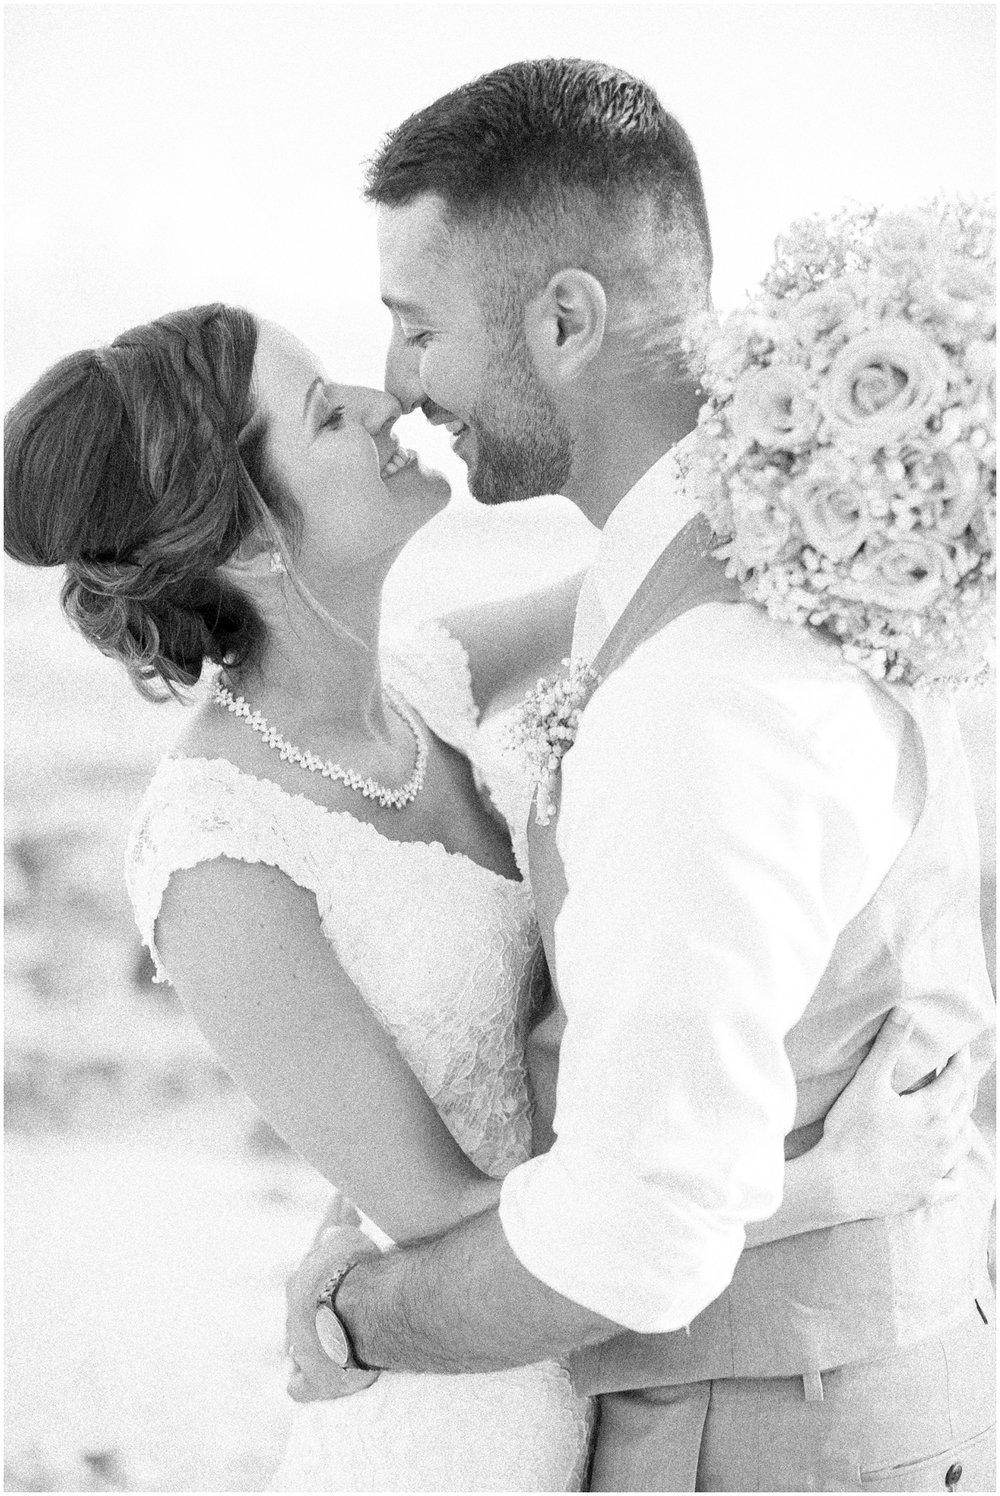 Riviera_Maya_Wedding_Barcelo_Palace_Destination_Photographer_3003.jpg